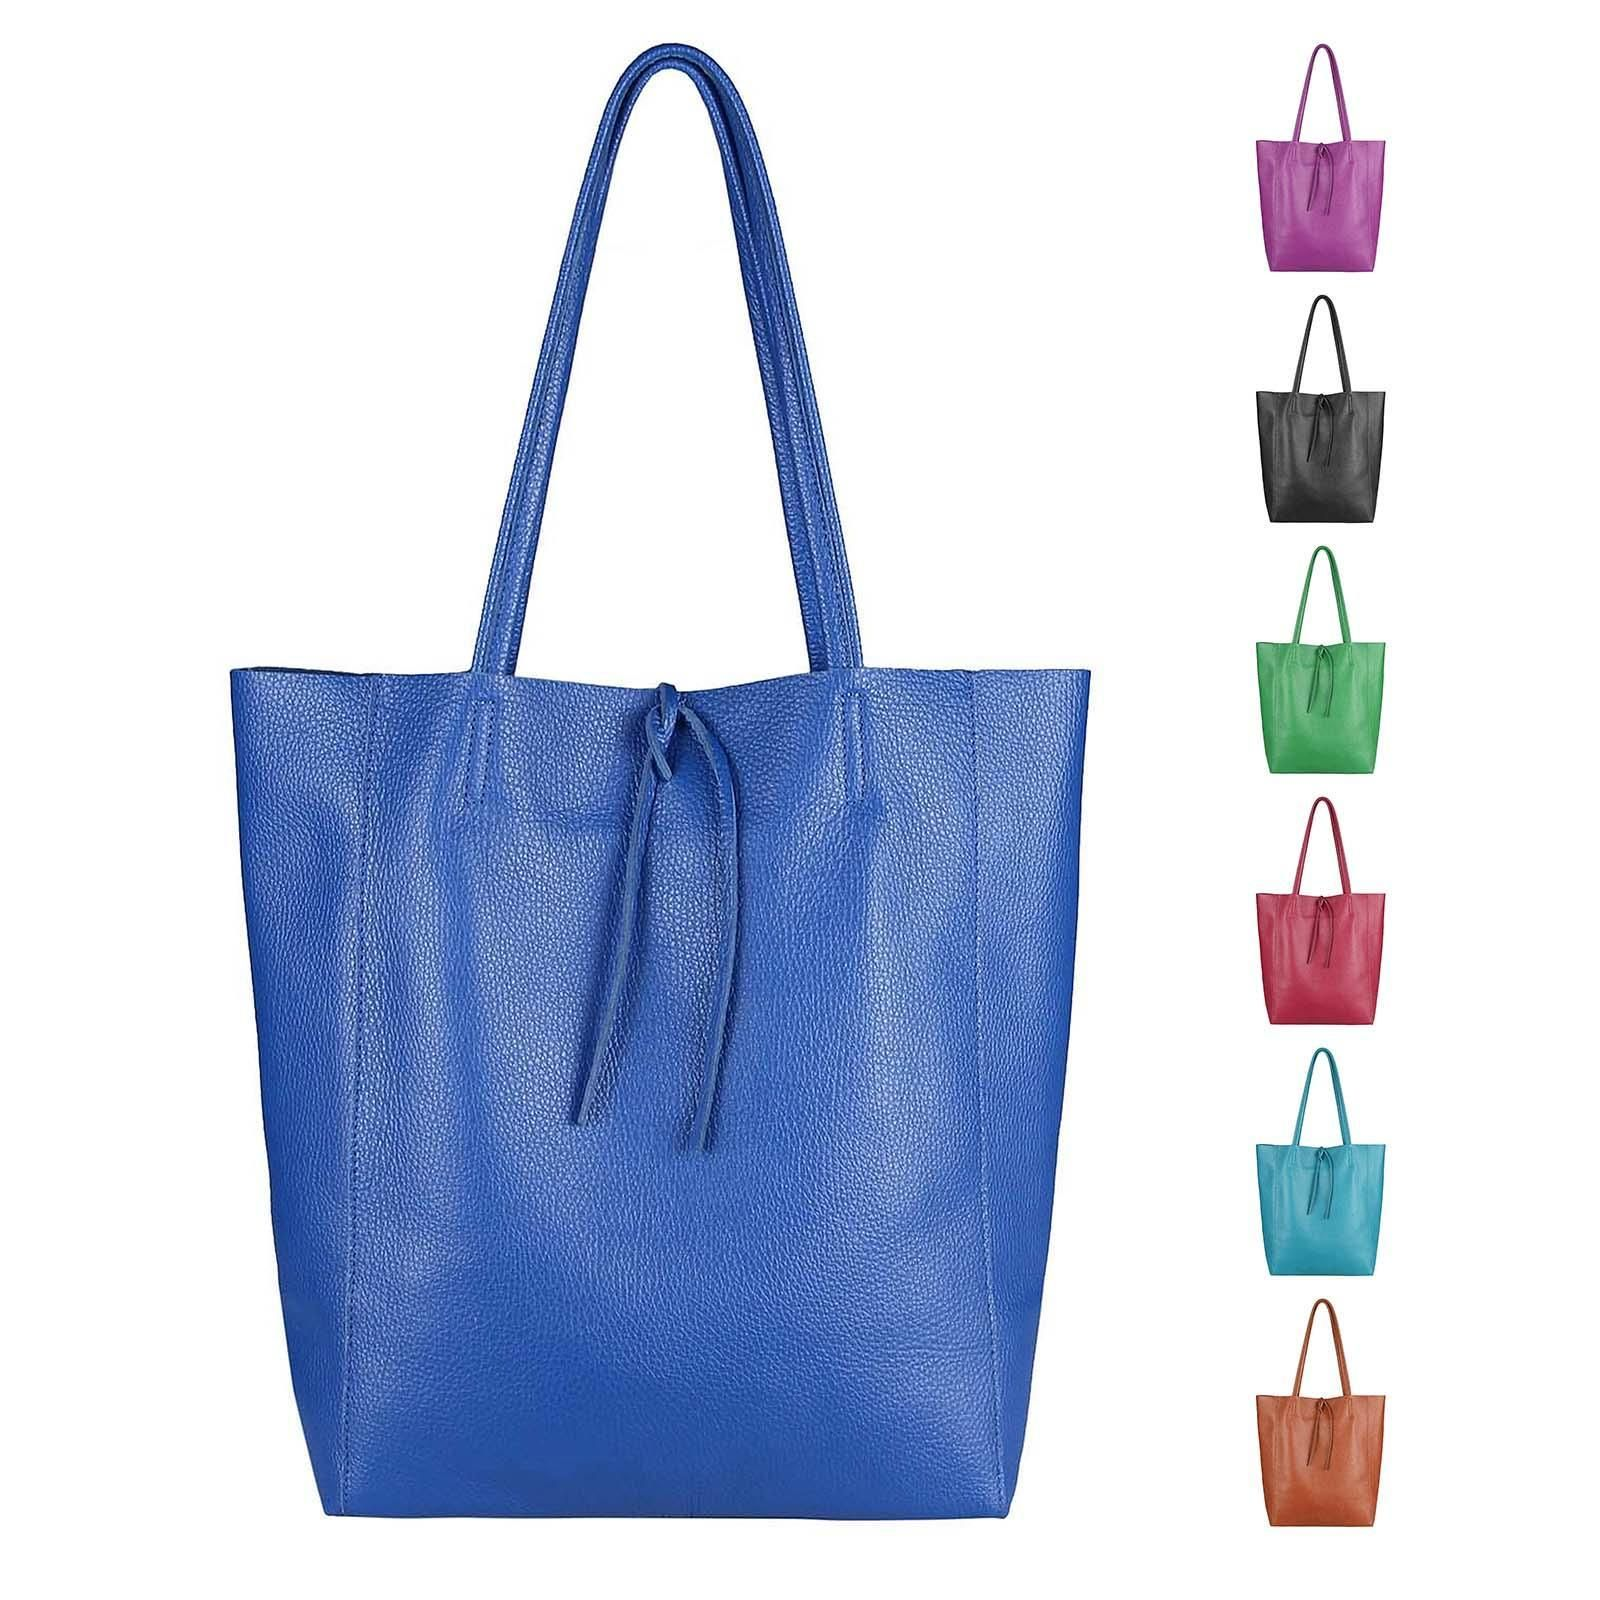 f3f367a860d8c OBC Made in Italy DAMEN LEDER TASCHE DIN-A4 Shopper Schultertasche  Henkeltasche Tote Bag Metallic